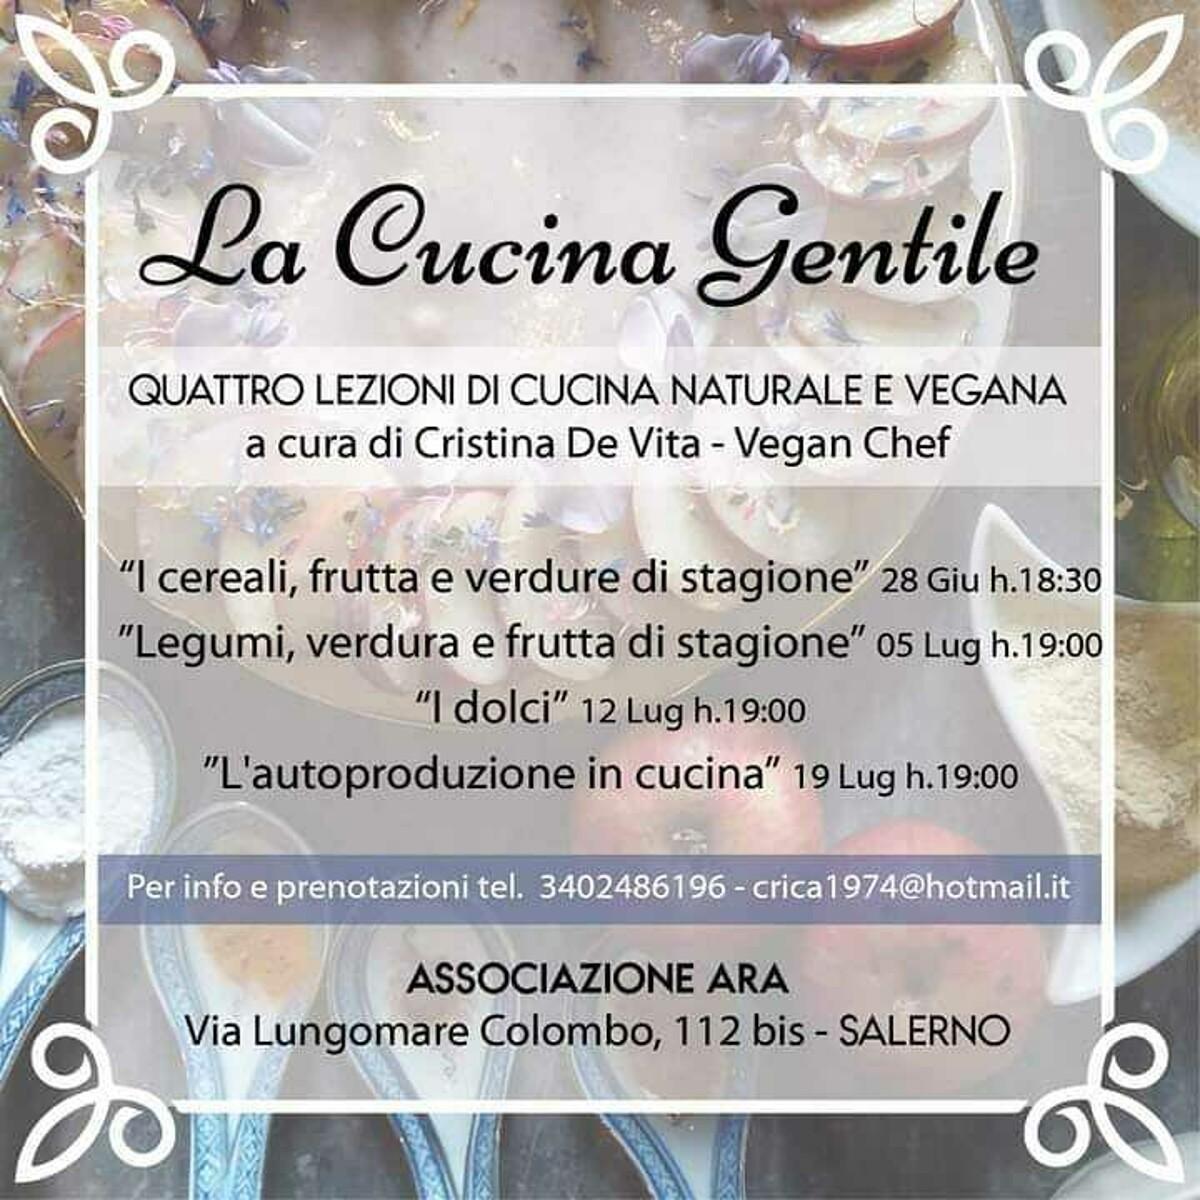 Bontà vegane e autoproduzione: tutti a scoprire i segreti della cucina gentile di Cristina De Vita